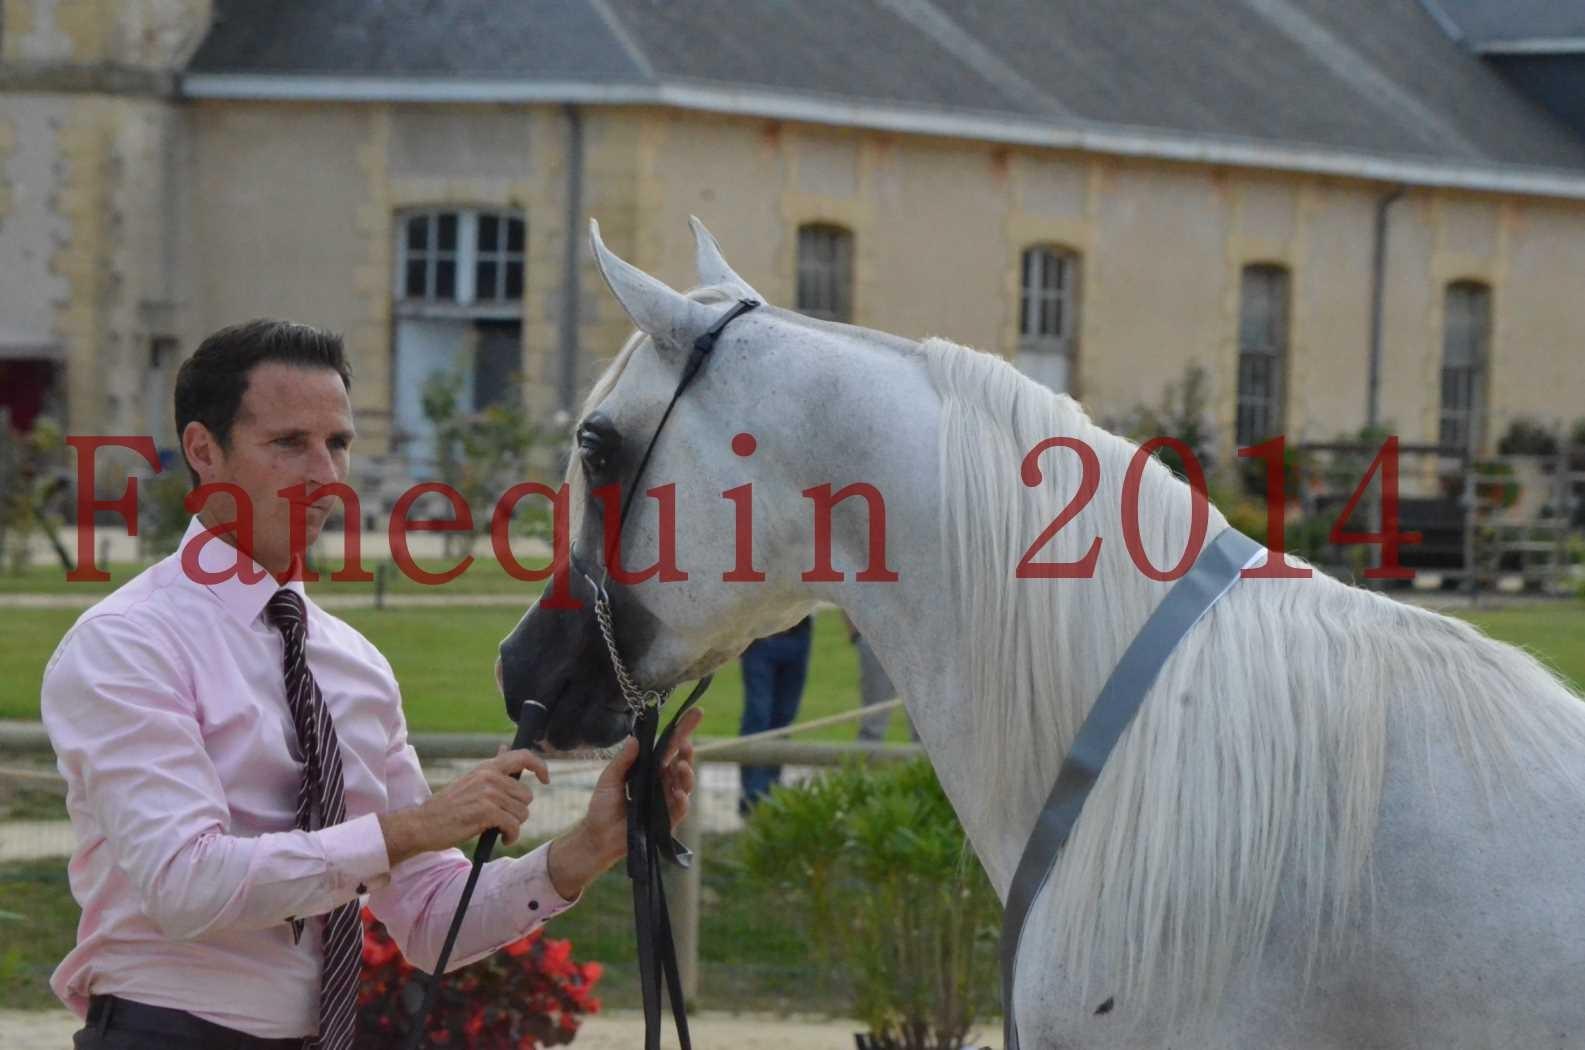 CHAMPIONNAT DE FRANCE 2014 A POMPADOUR - Championnat - FA STARLIGHT - 17